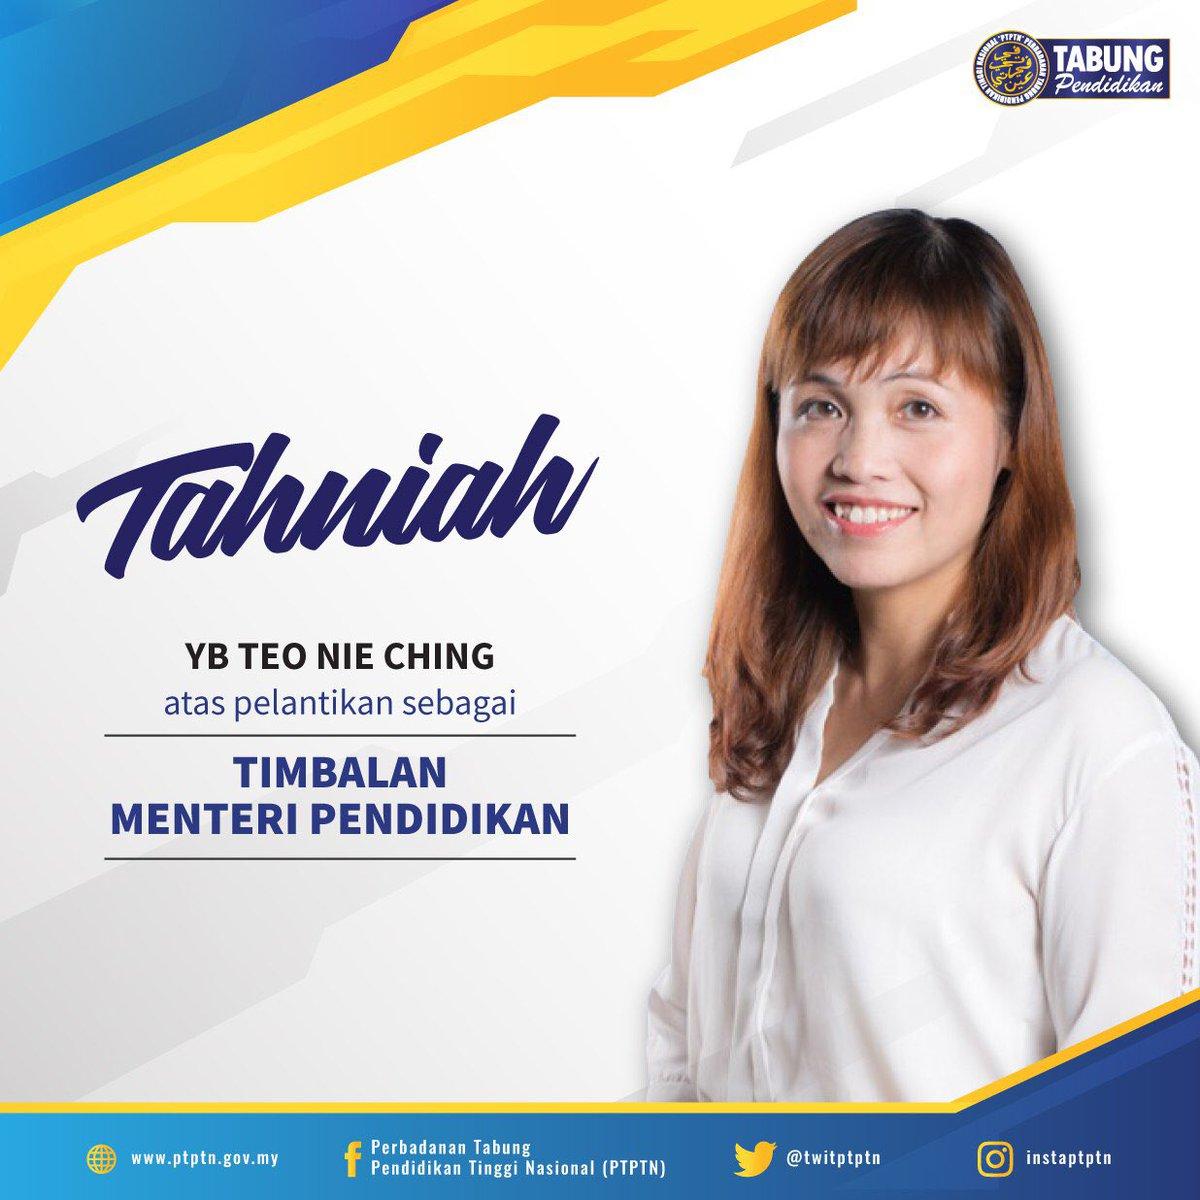 Ptptn On Twitter Tahniah Di Atas Pelantikan Yb Teo Nie Ching Ahli Parlimen Kulai Johor Yang Dilantik Sebagai Timbalan Menteri Pendidikan Yang Baharu Ptptn Mengalu Alukan Yb Memimpin Kementerian Pendidikan Demi Masa Depan